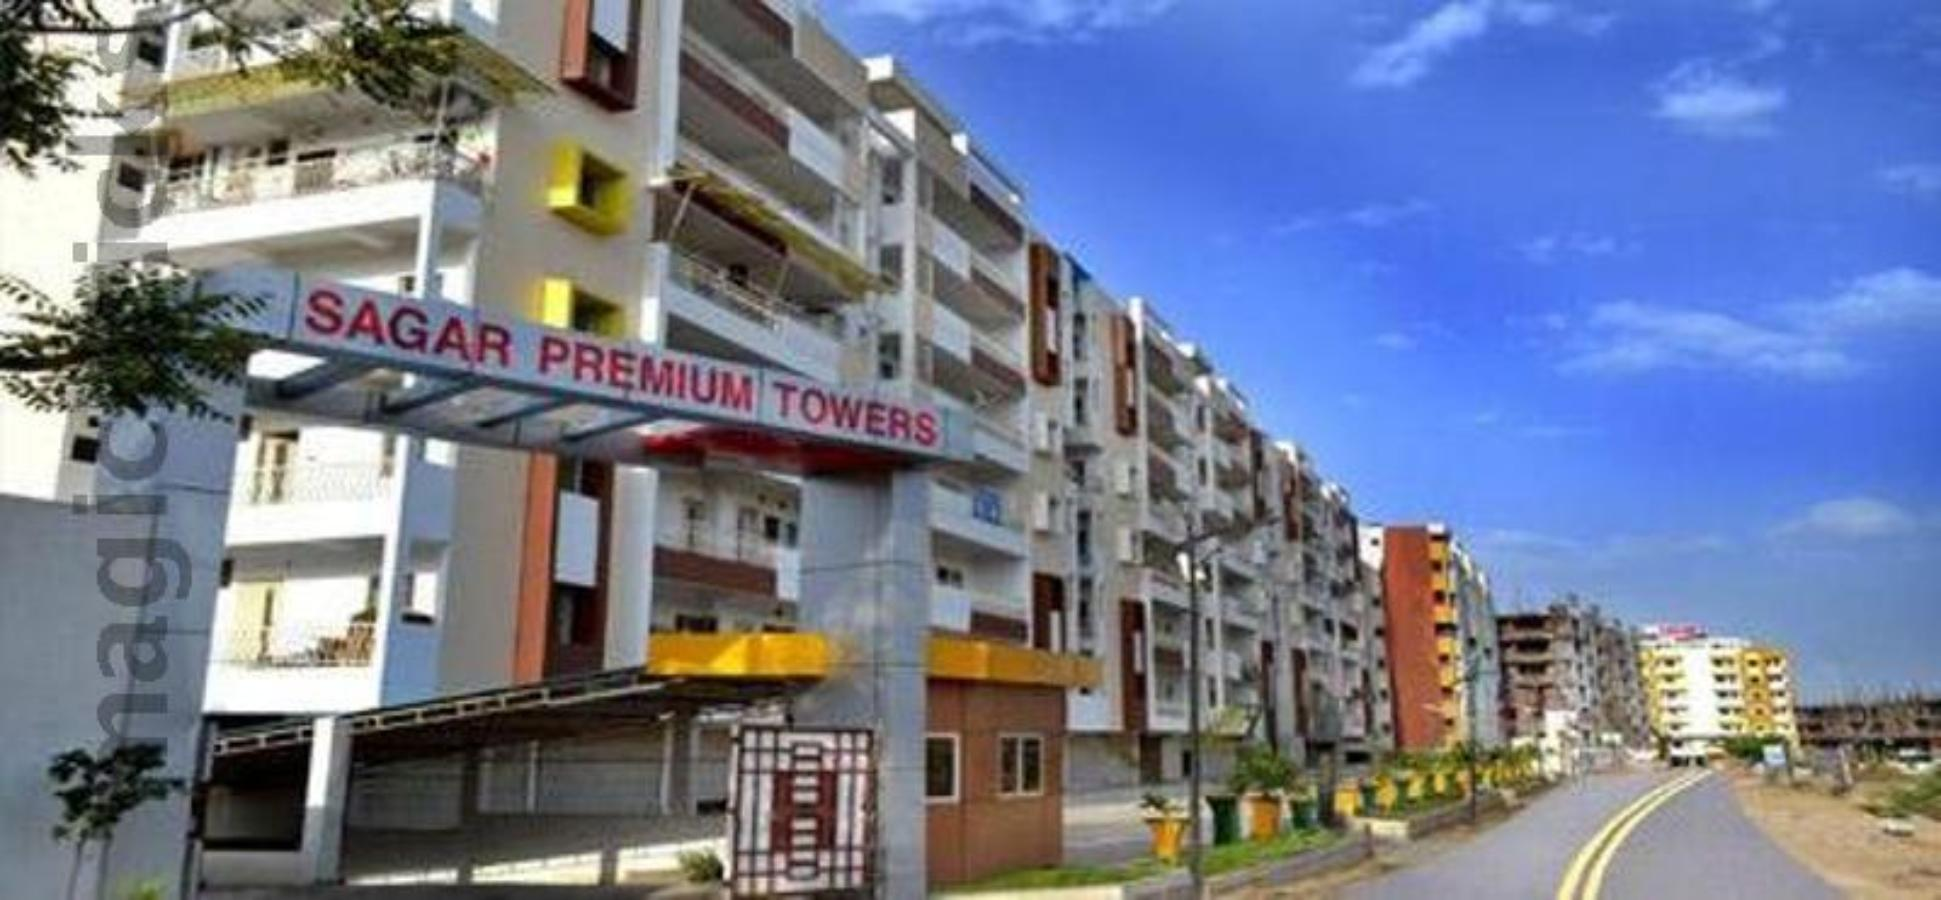 Sagar Premium Towers In Kolar Road Bhopal By Agrawal